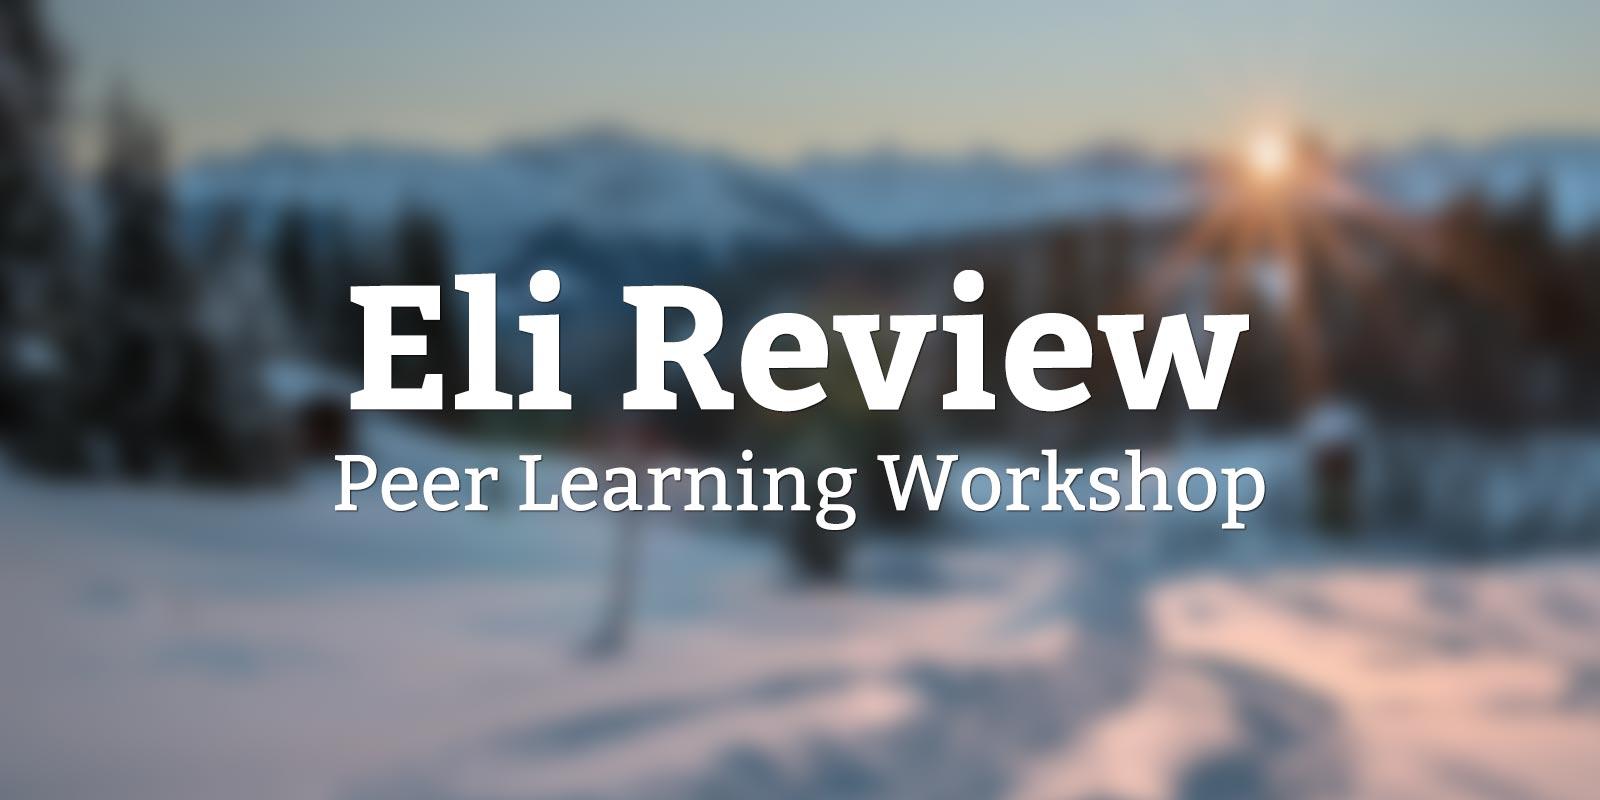 Eli Review Peer Learning Workshop Announcement